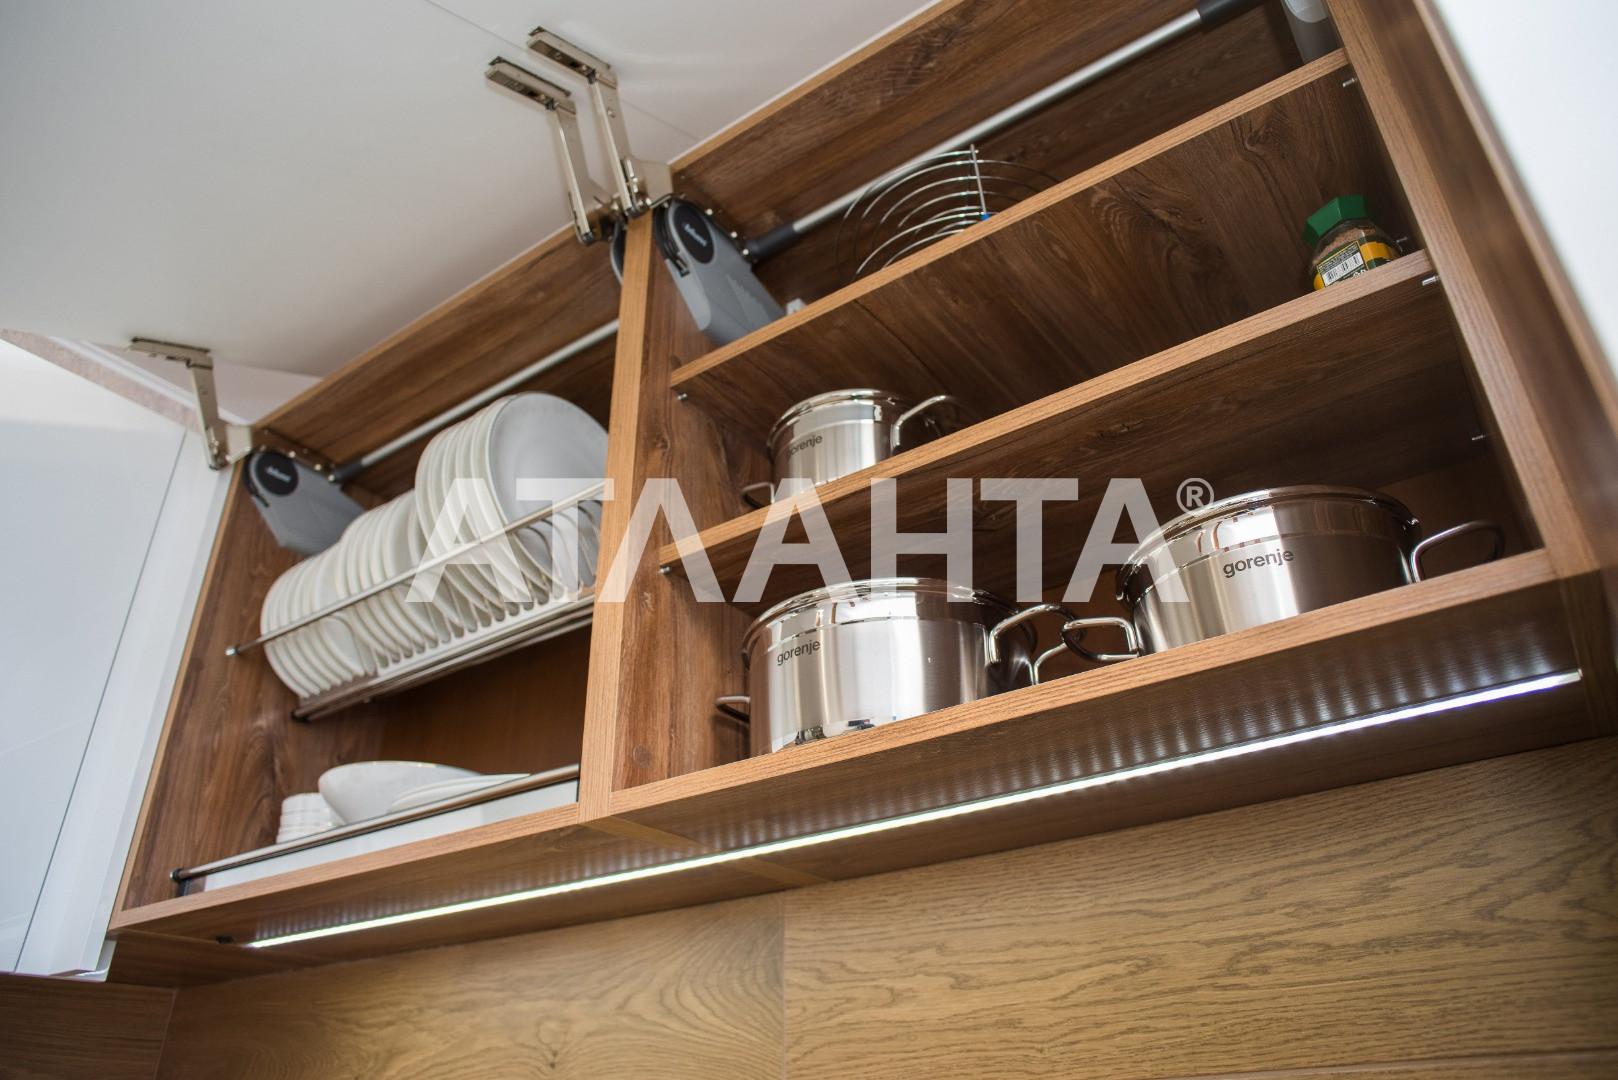 Продается 1-комнатная Квартира на ул. Балковская (Фрунзе) — 50 000 у.е. (фото №8)